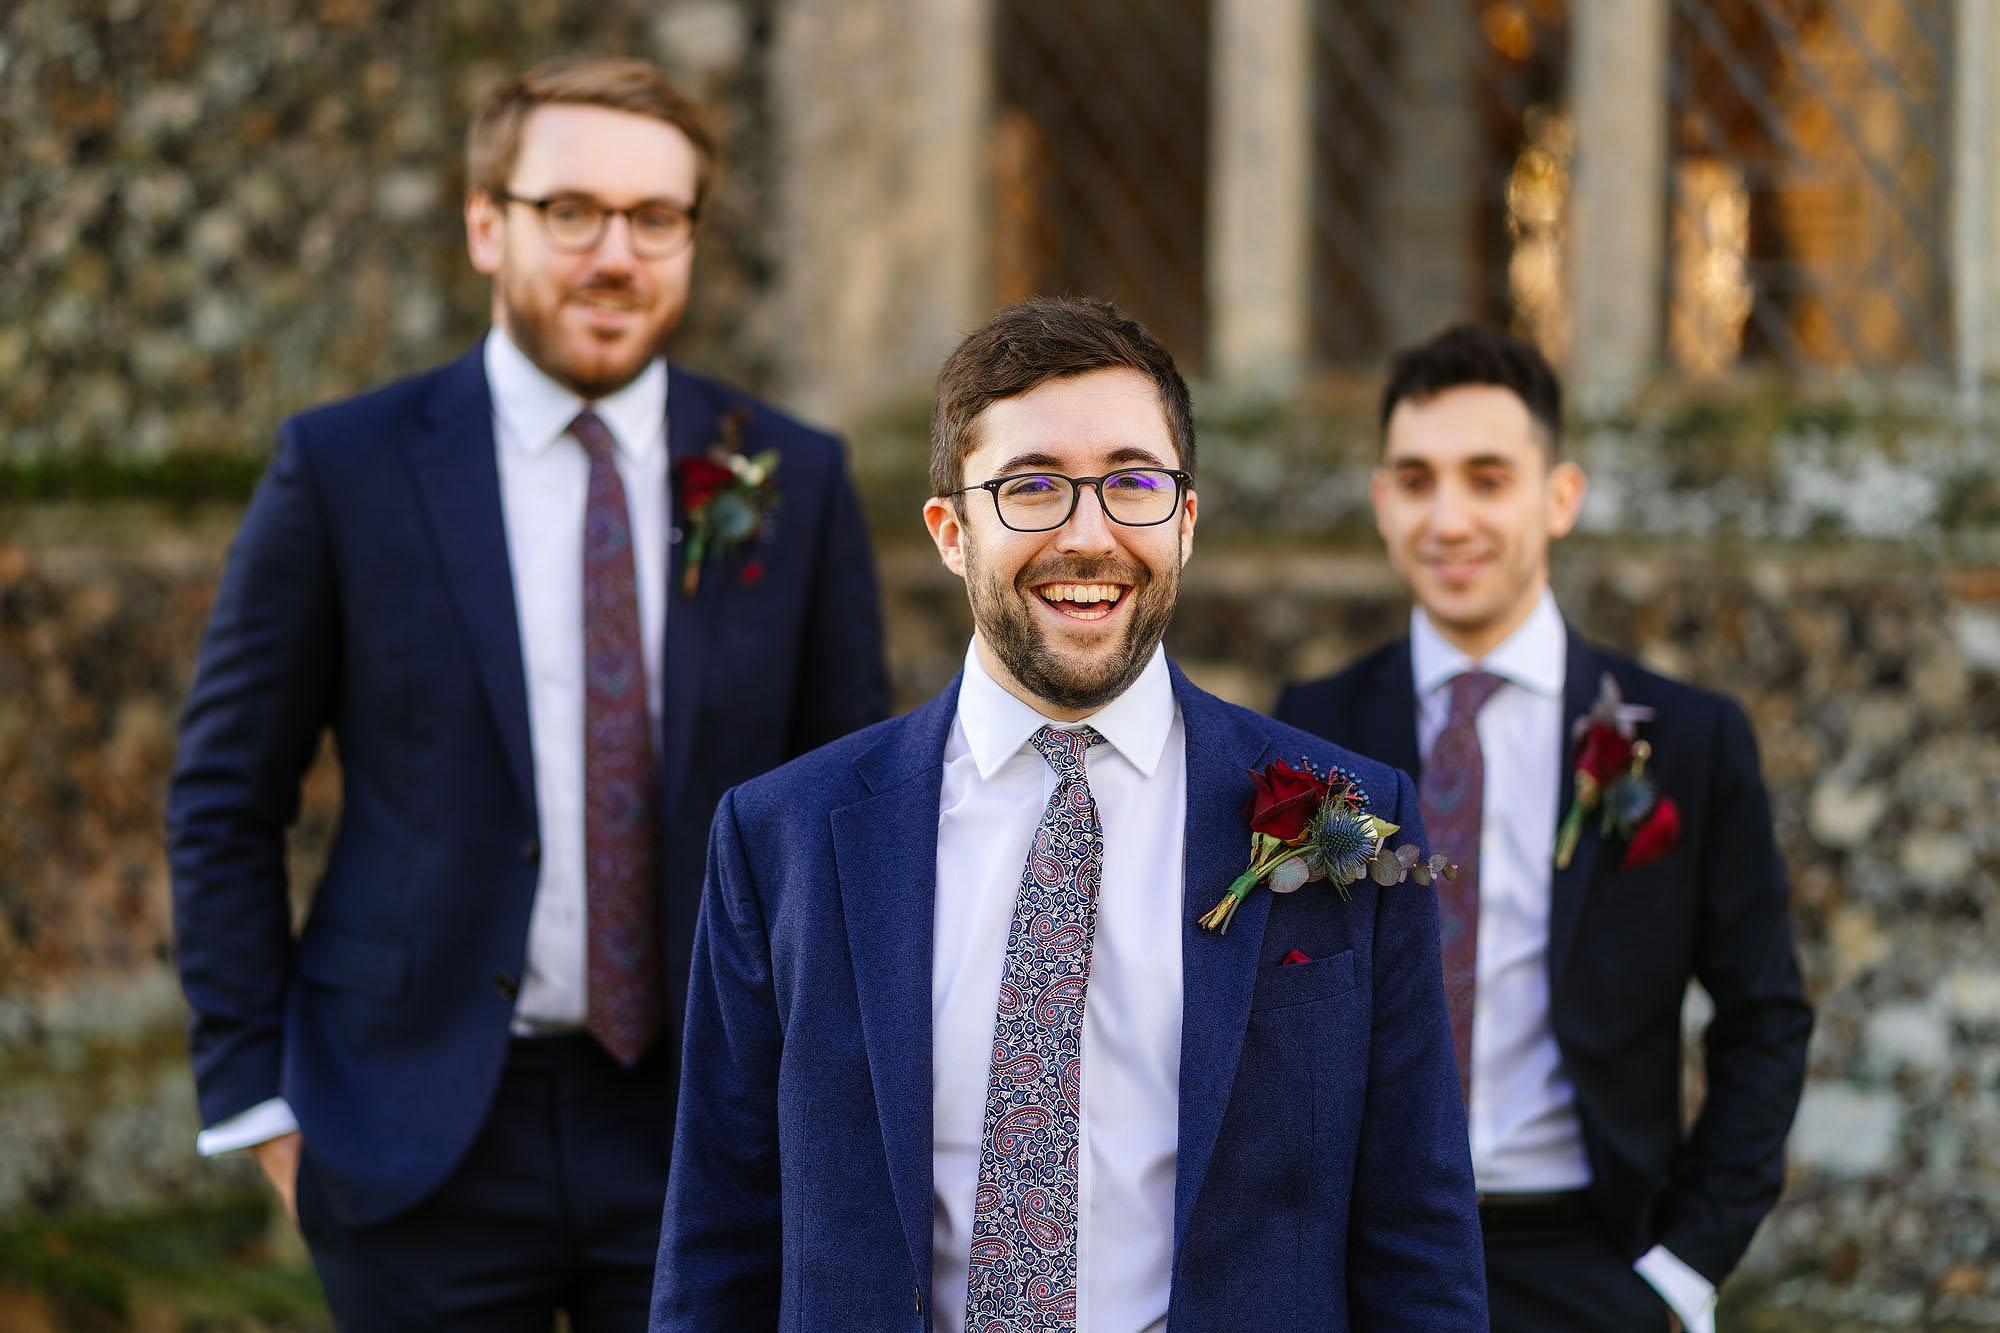 Blythburgh church groom